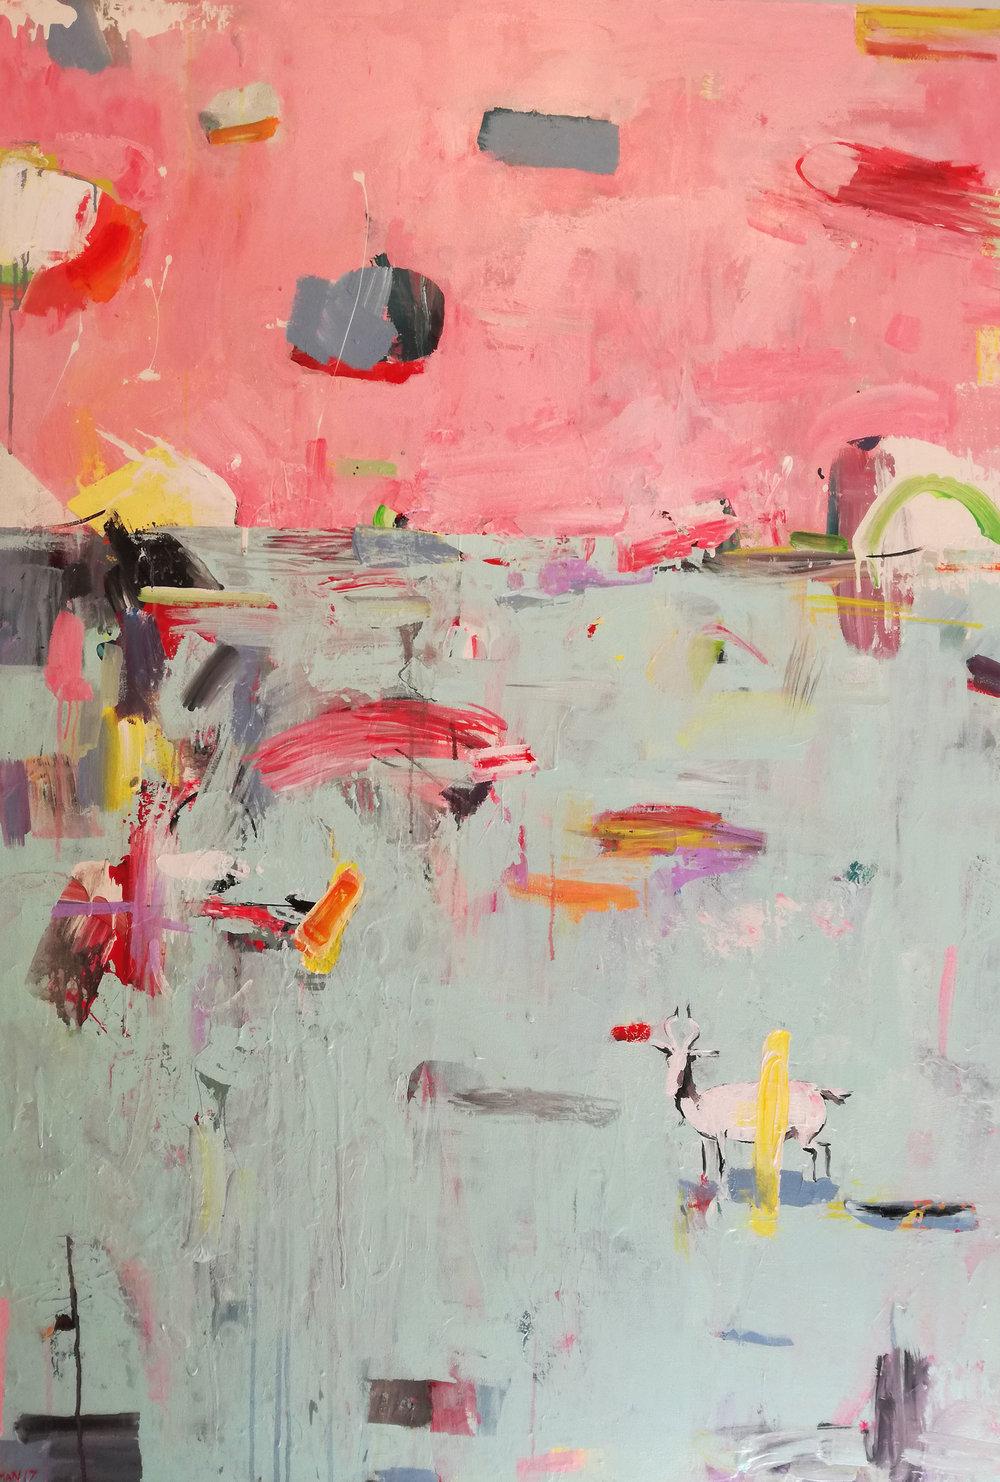 ' Landskap I'   Su Opperman  Mixed media on canvas  1540 x 1060 x 30 mm  R 18 000.00 excl. vat (SOLD)